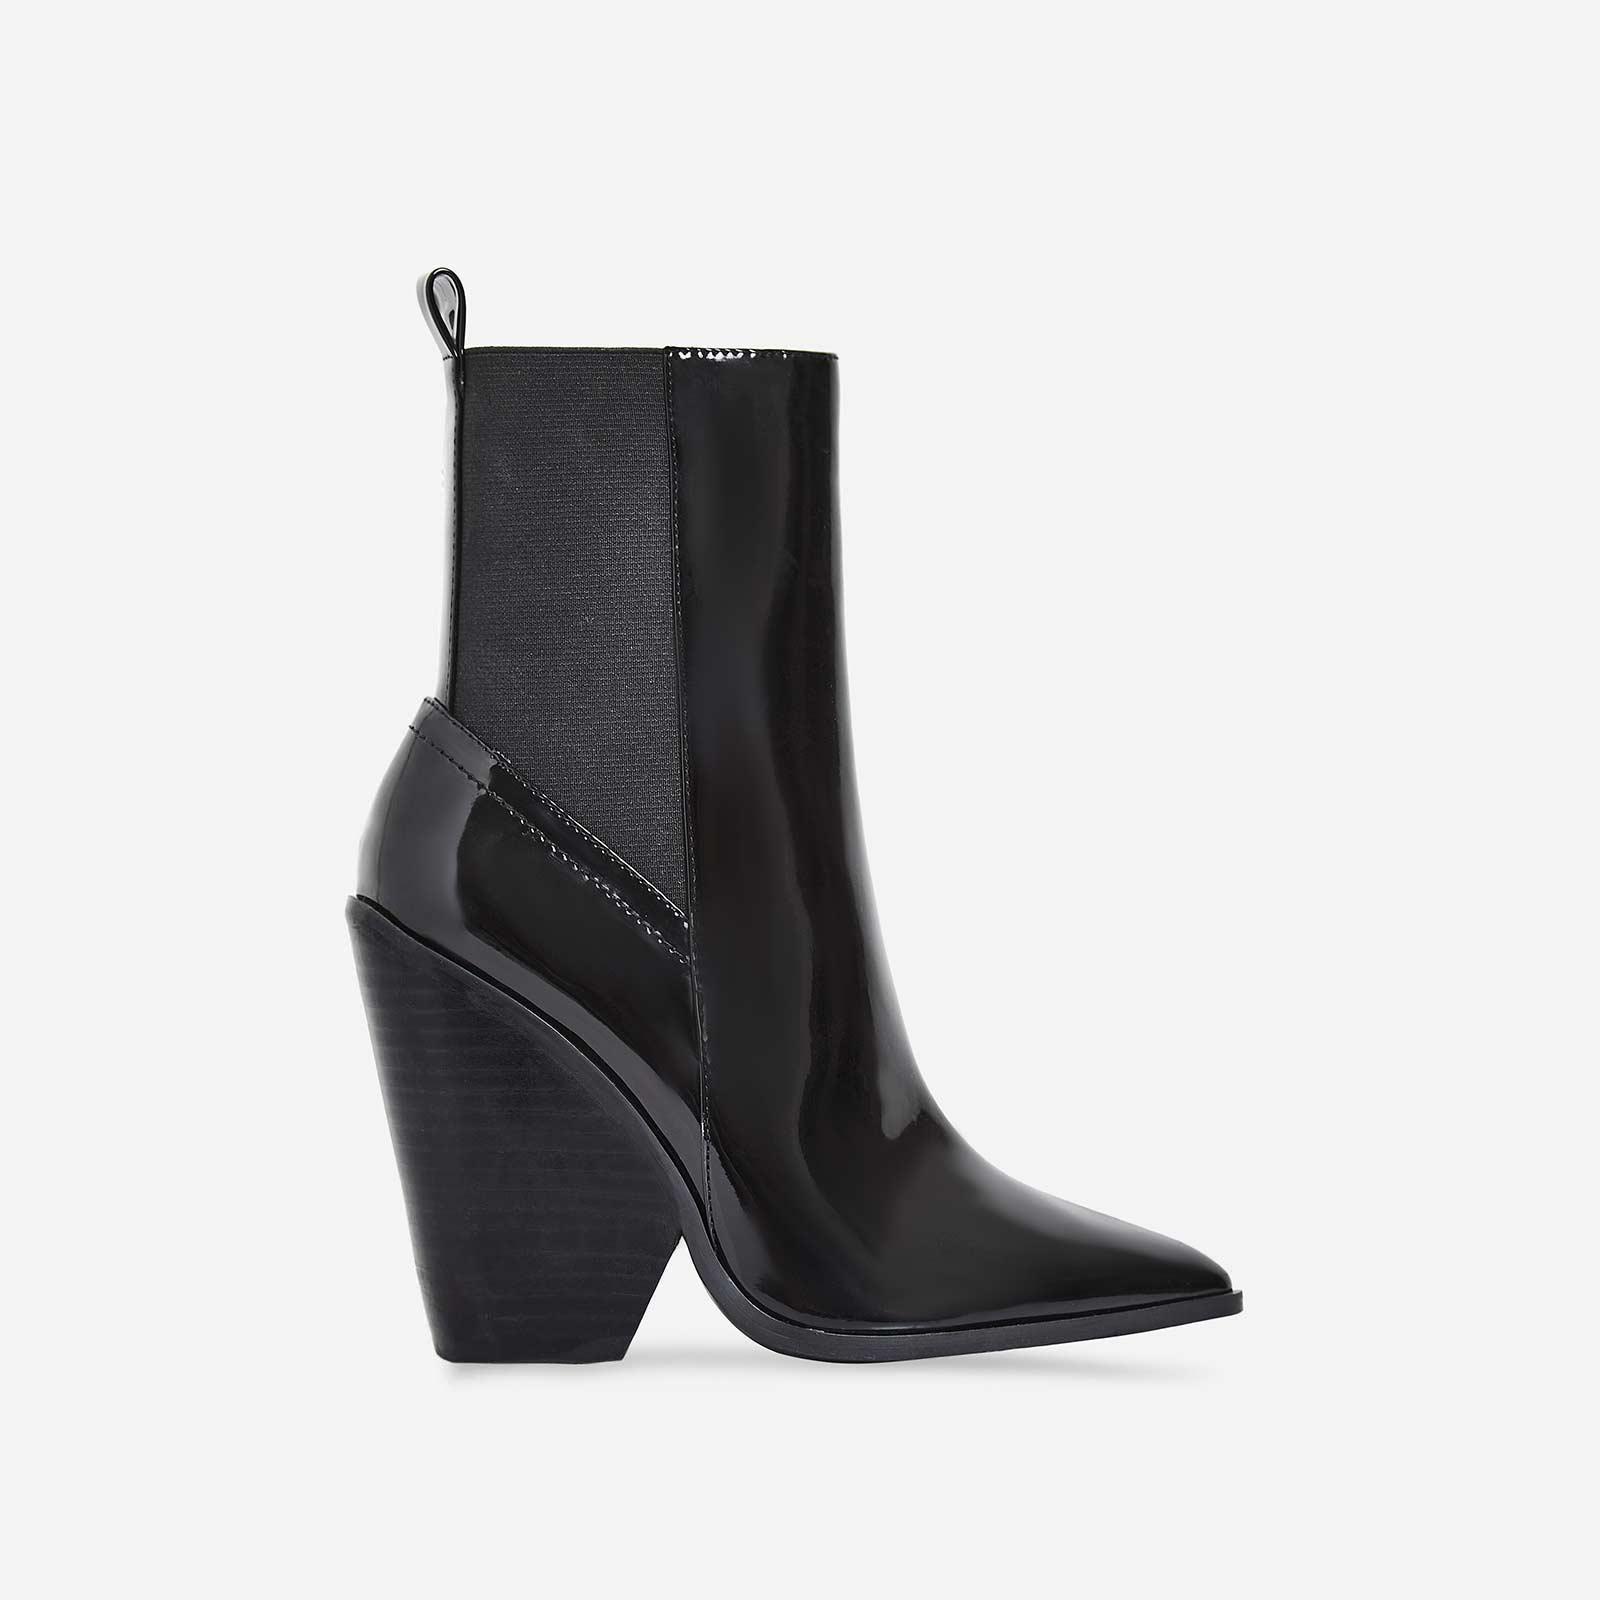 Bella Black Heel Ankle Boot In Black Patent